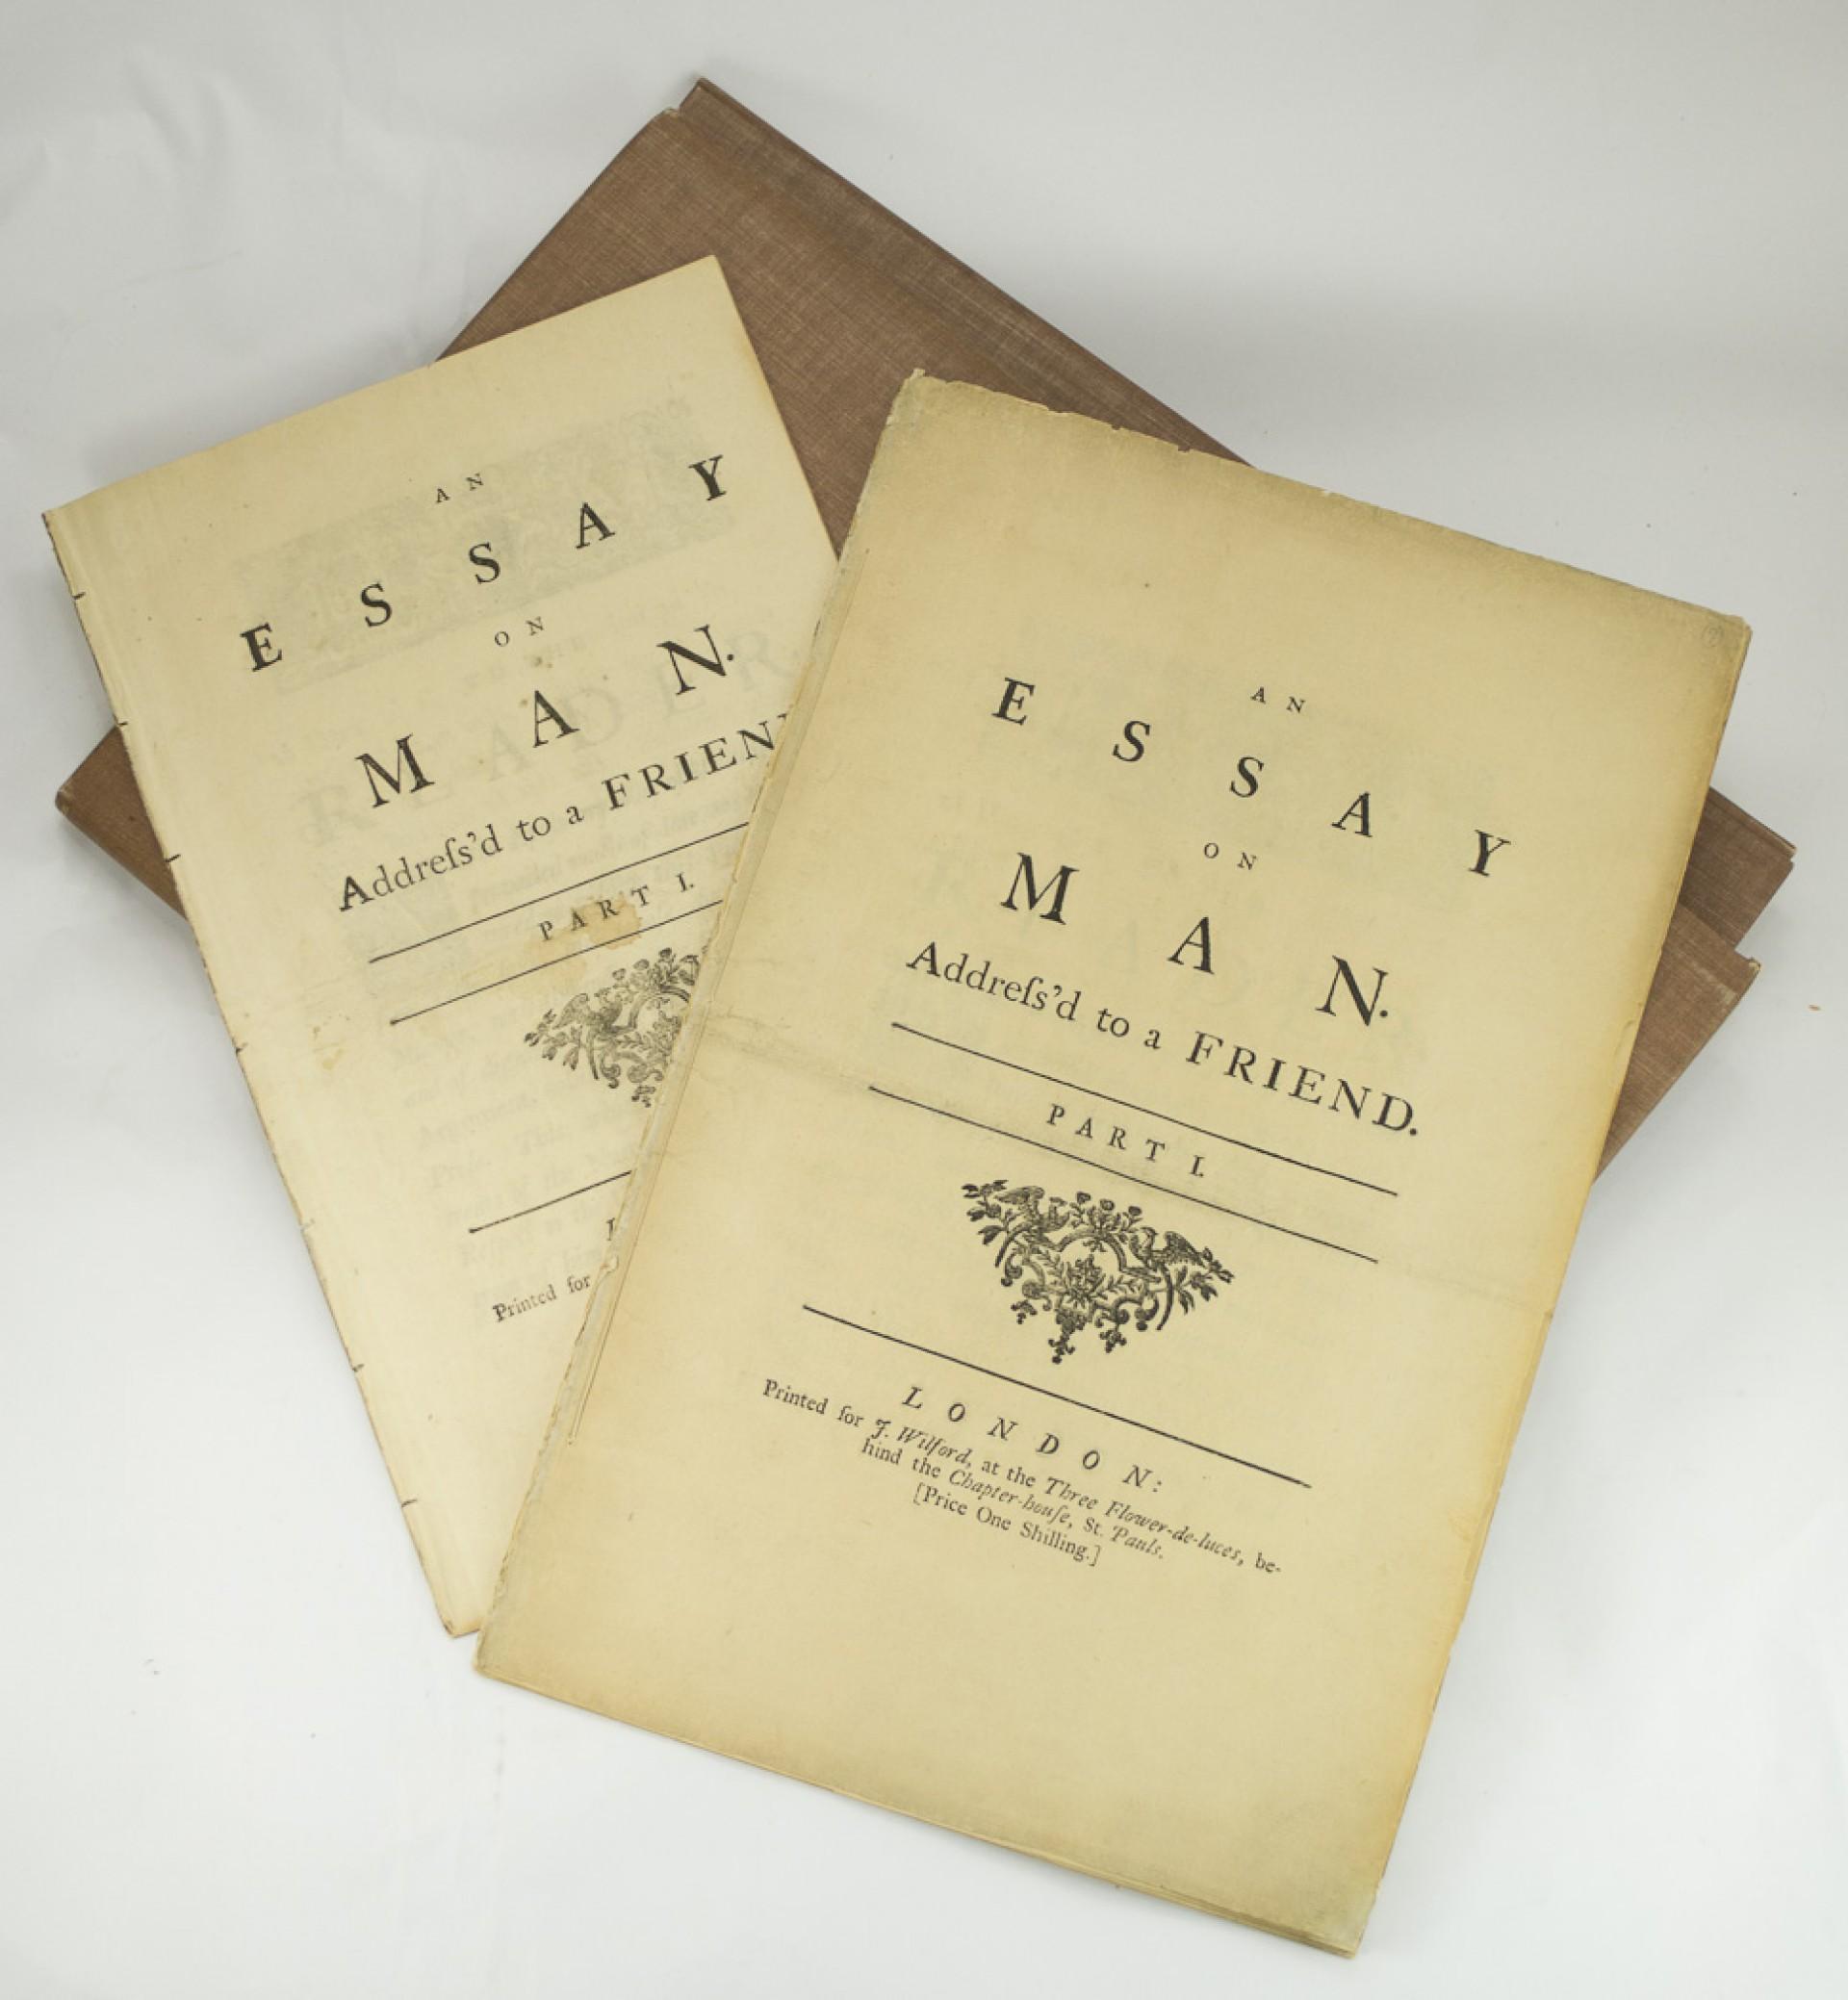 006 65395 1 Essay Example Alexander Pope On Dreaded Man Summary Epistle 2 Pdf 1920